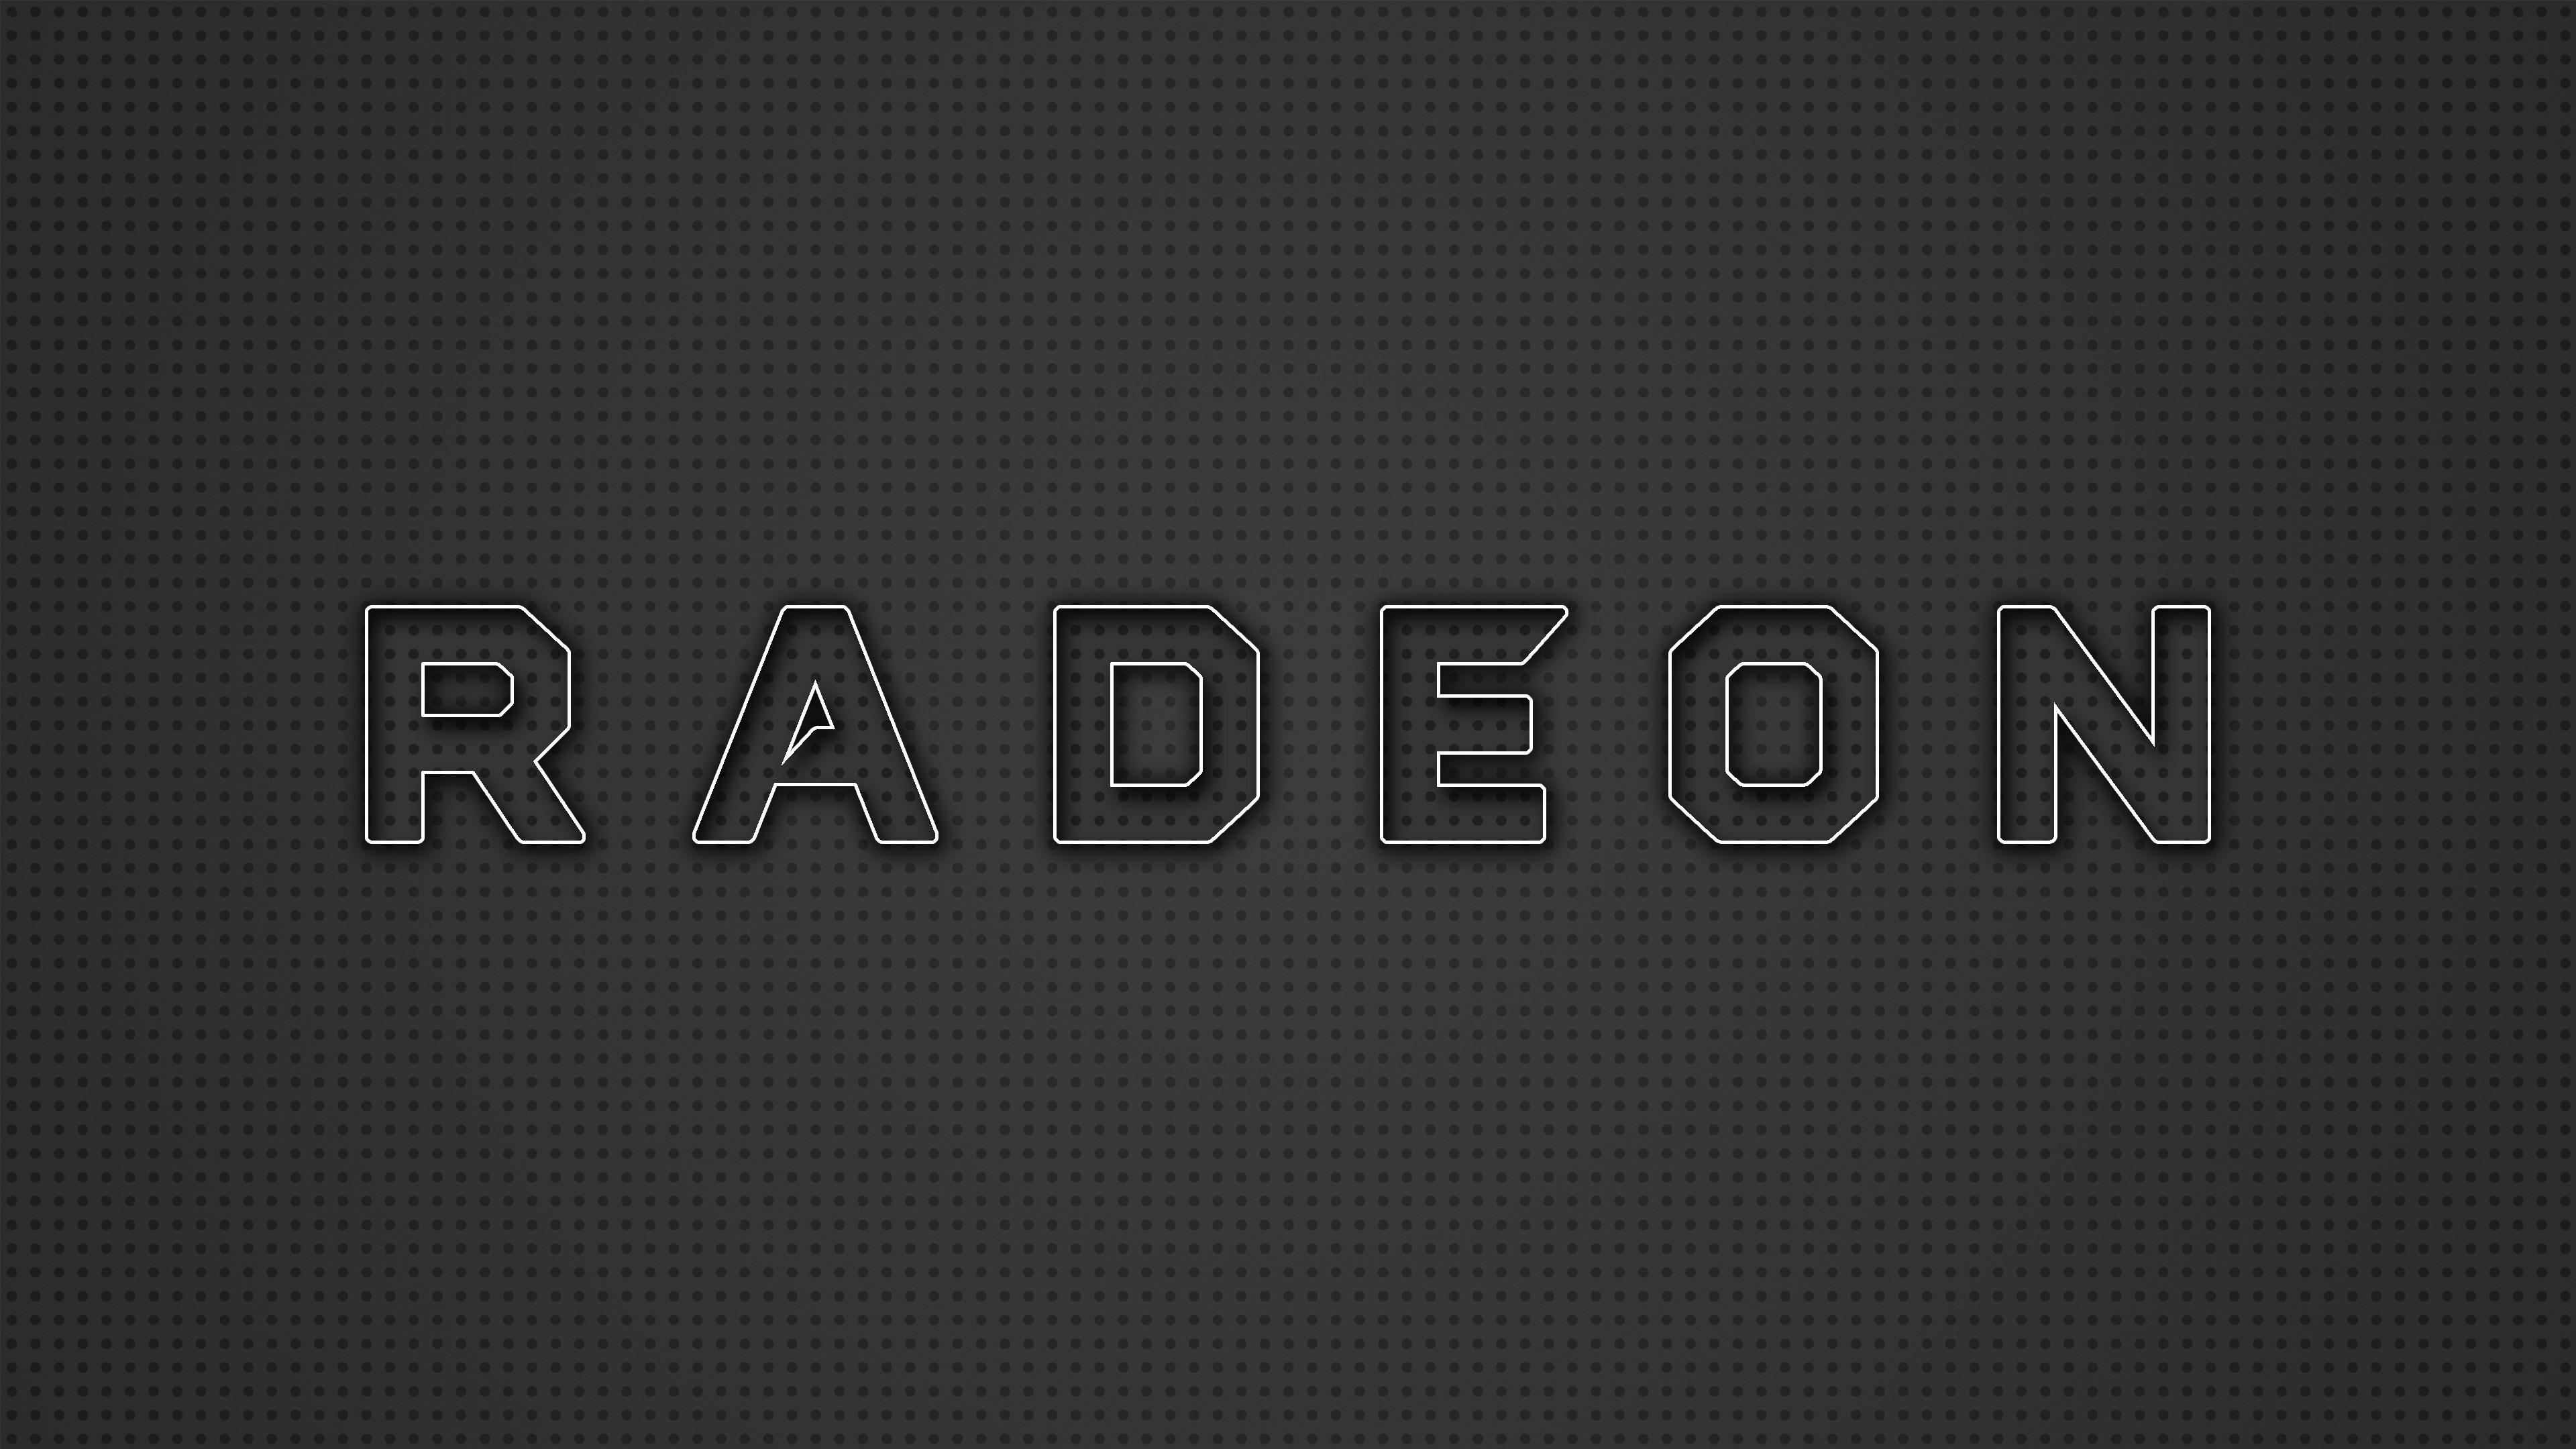 … New Radeon Logo 4K Wallpaper by RV770